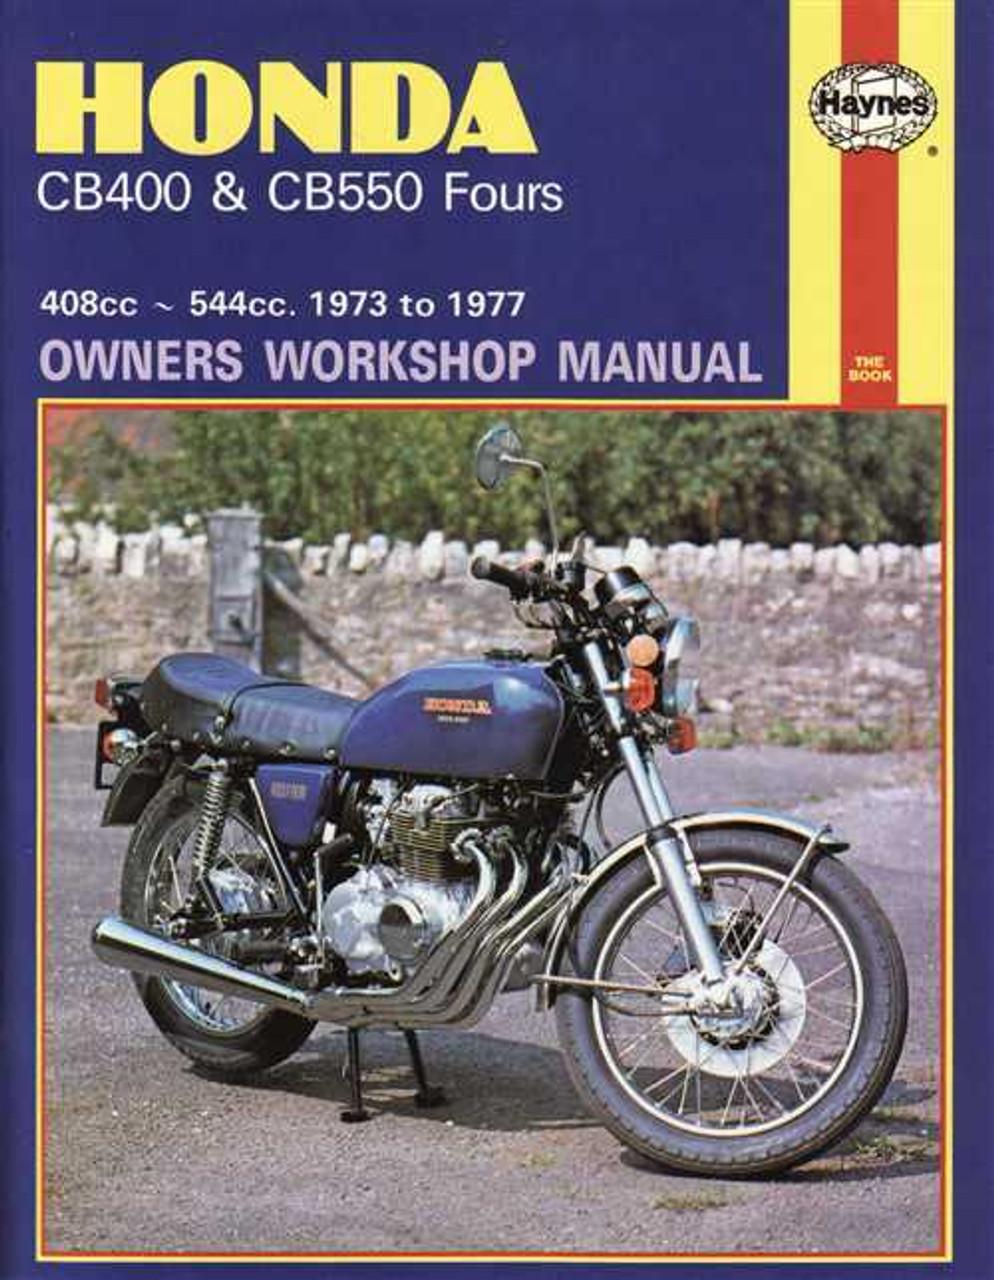 honda cb400 amp cb550 fours 408cc amp 544cc 1973 1977 workshop rh automotobookshop com au Honda CB450 Honda CB750